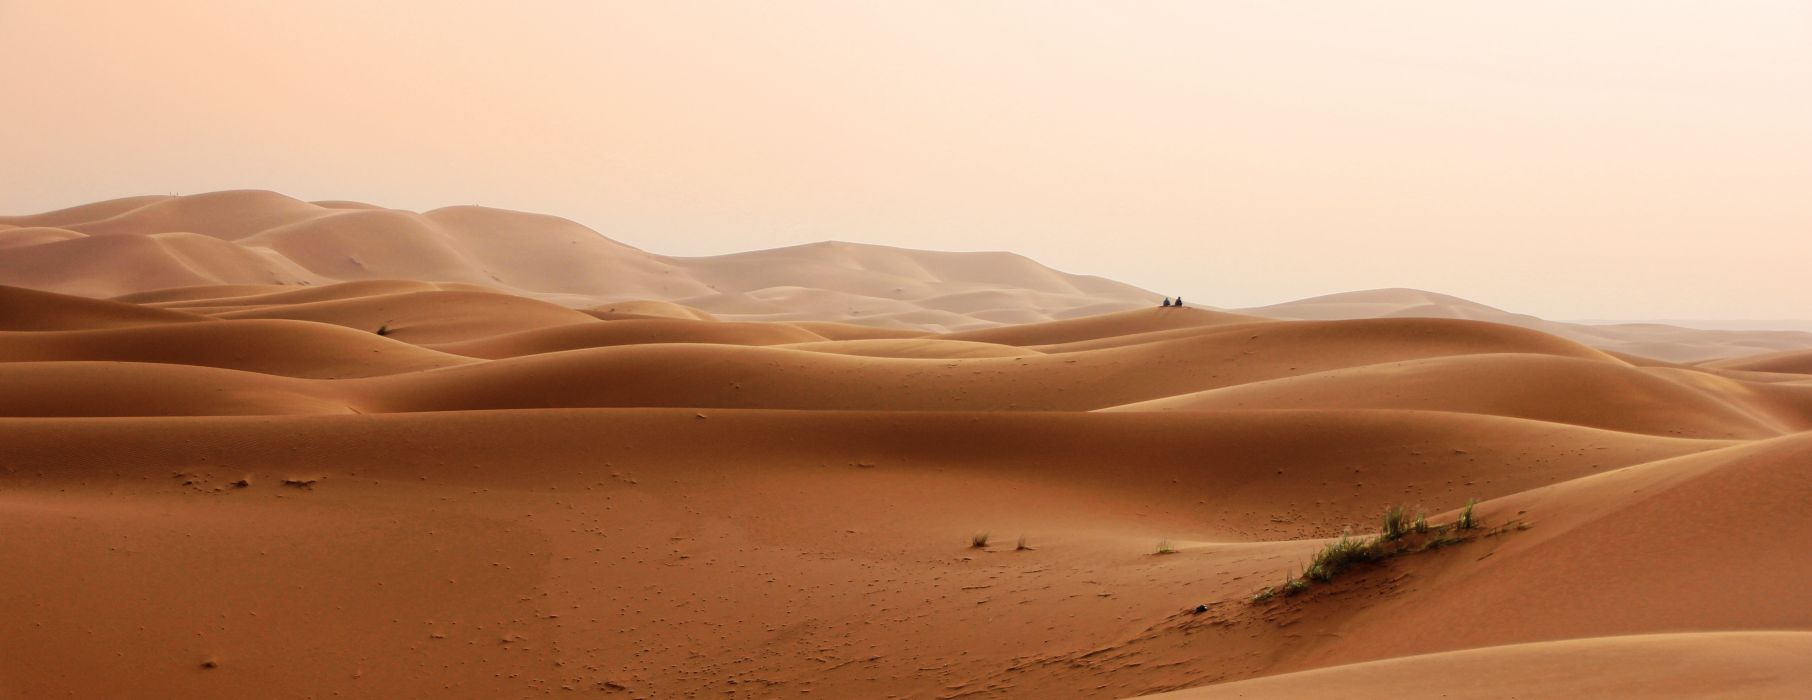 daylight desert drought dry dunes hot landscape nature outdoors remote sand sand dunes scenic sky wallpaper